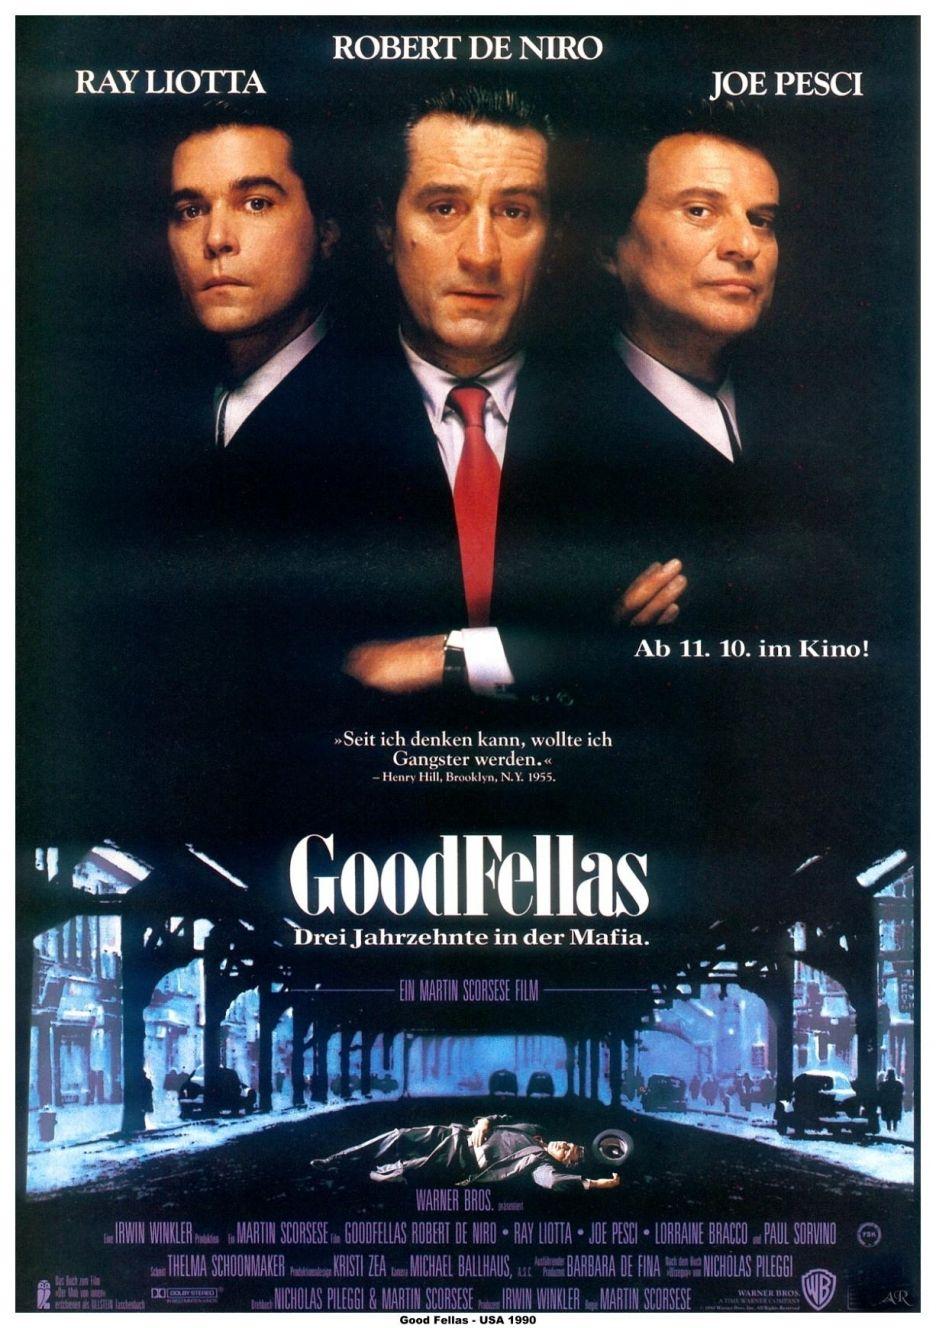 Goodfellas Released